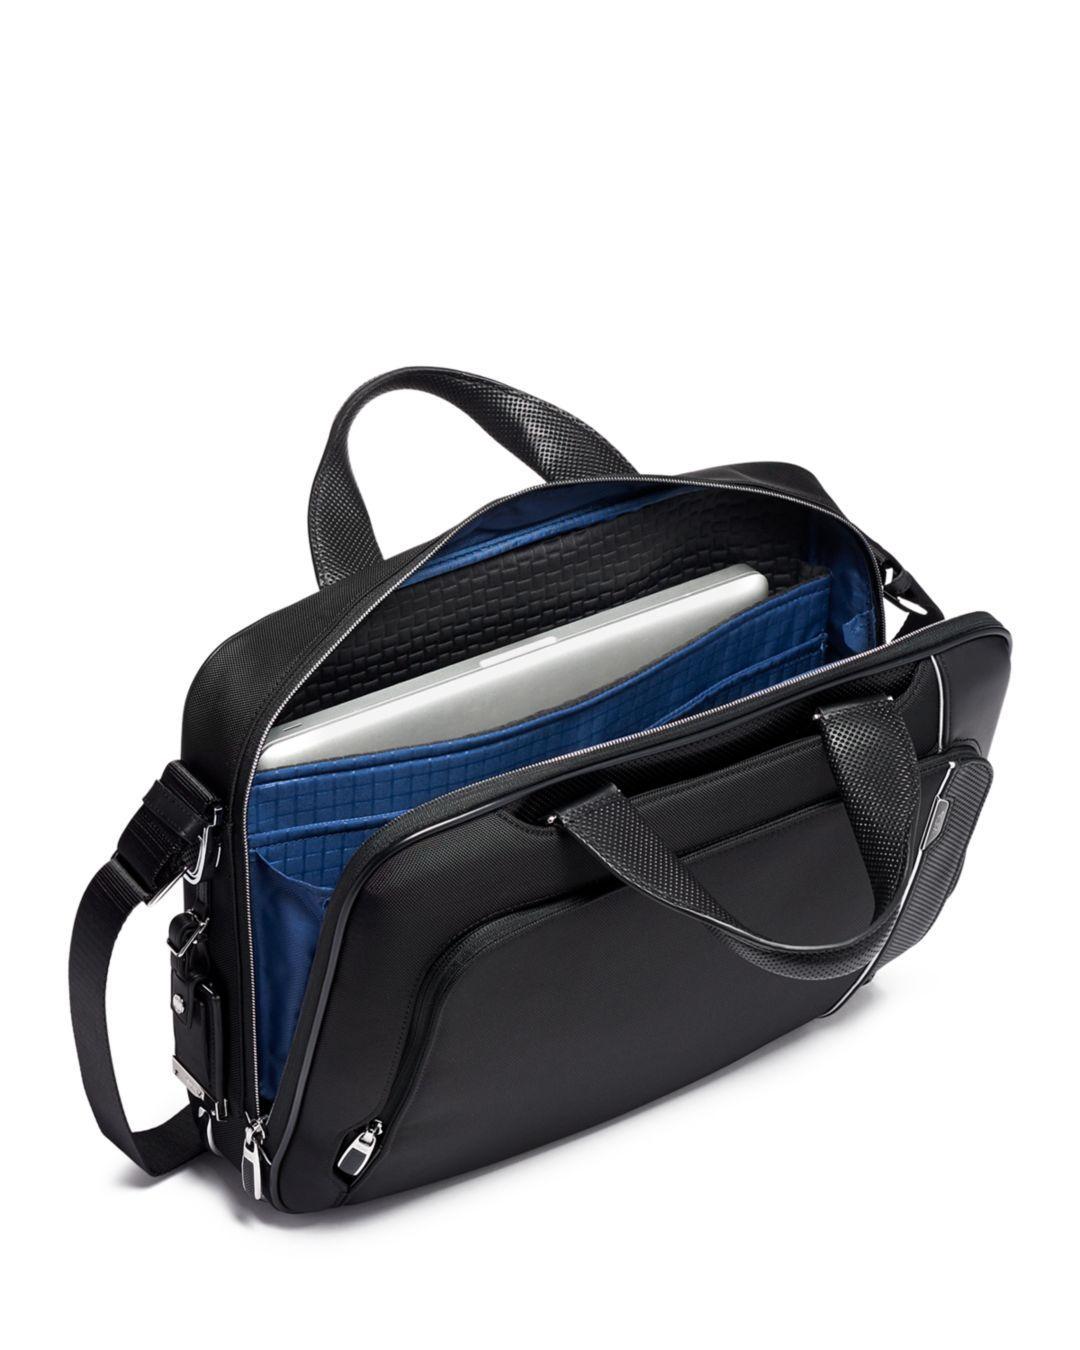 22df26665e4c Tumi Arriv Sadler Briefcase in Black for Men - Save 27% - Lyst